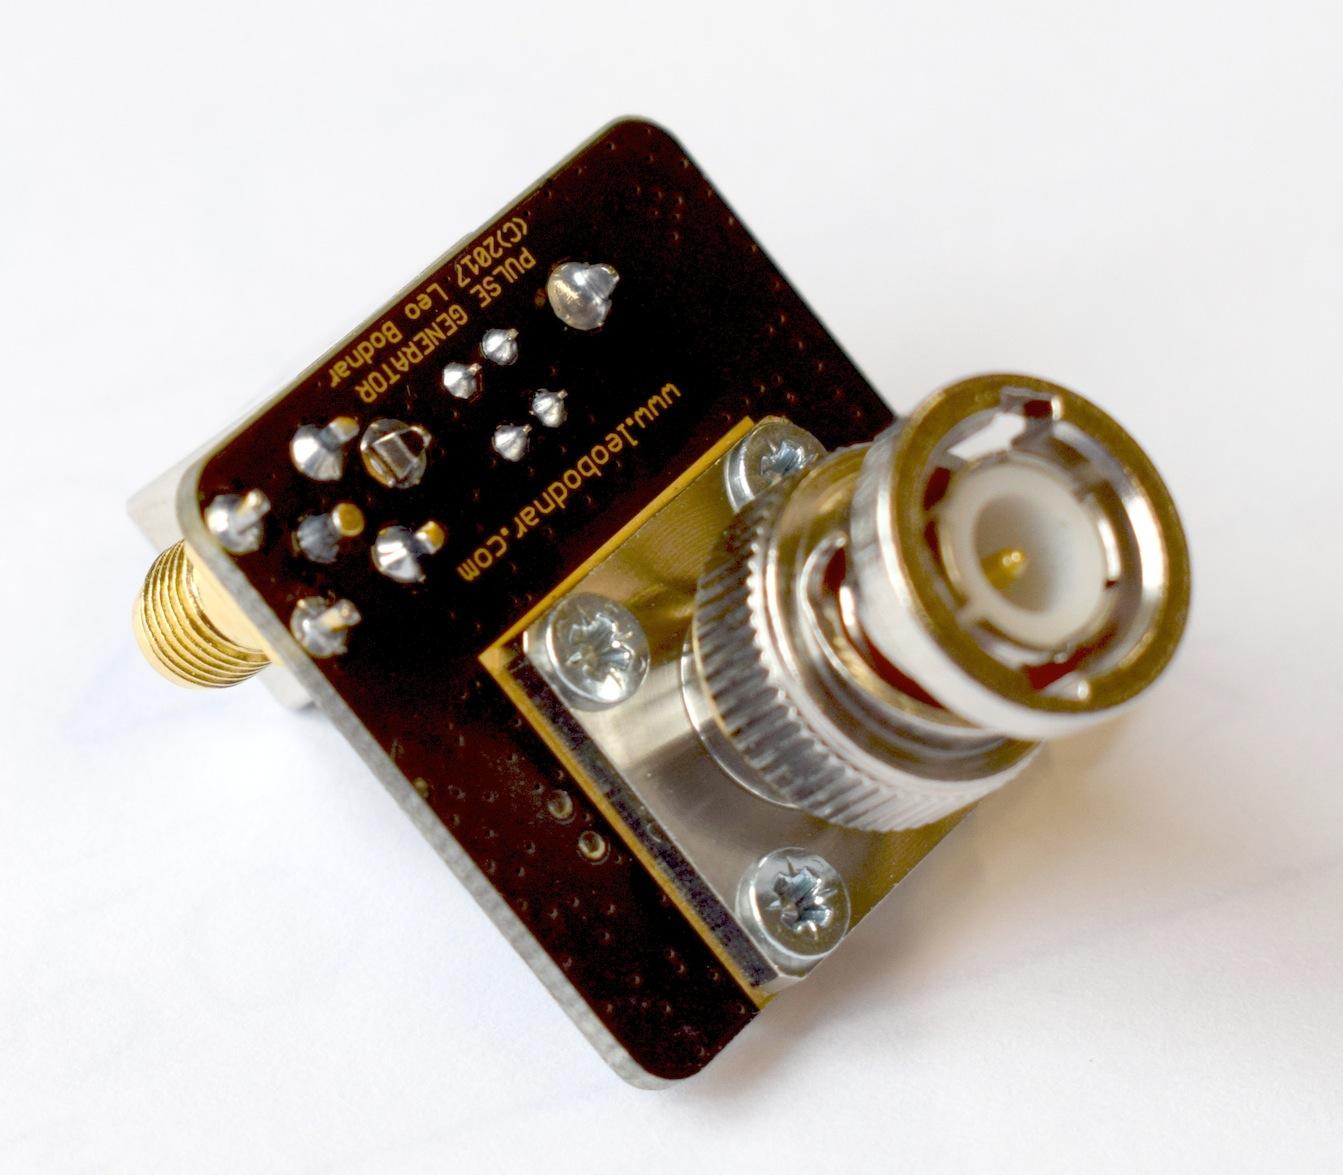 Fast Risetime Pulse Generator Pulser 4999gbp Leo Bodnar Generating Circuit